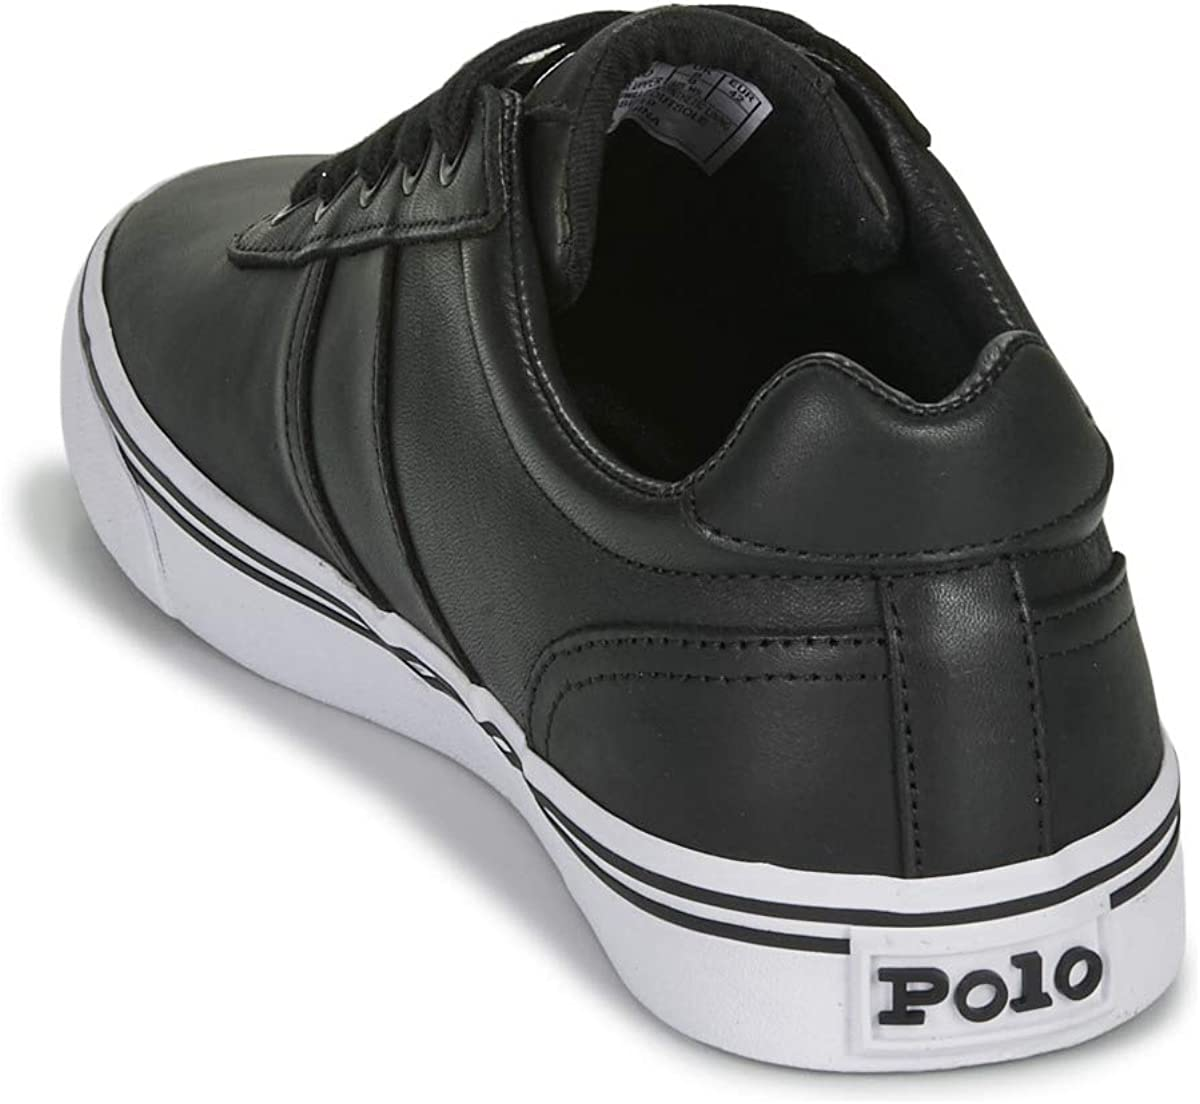 Polo Ralph Lauren, Hanford Leather Black, Zapatillas para Hombre ...